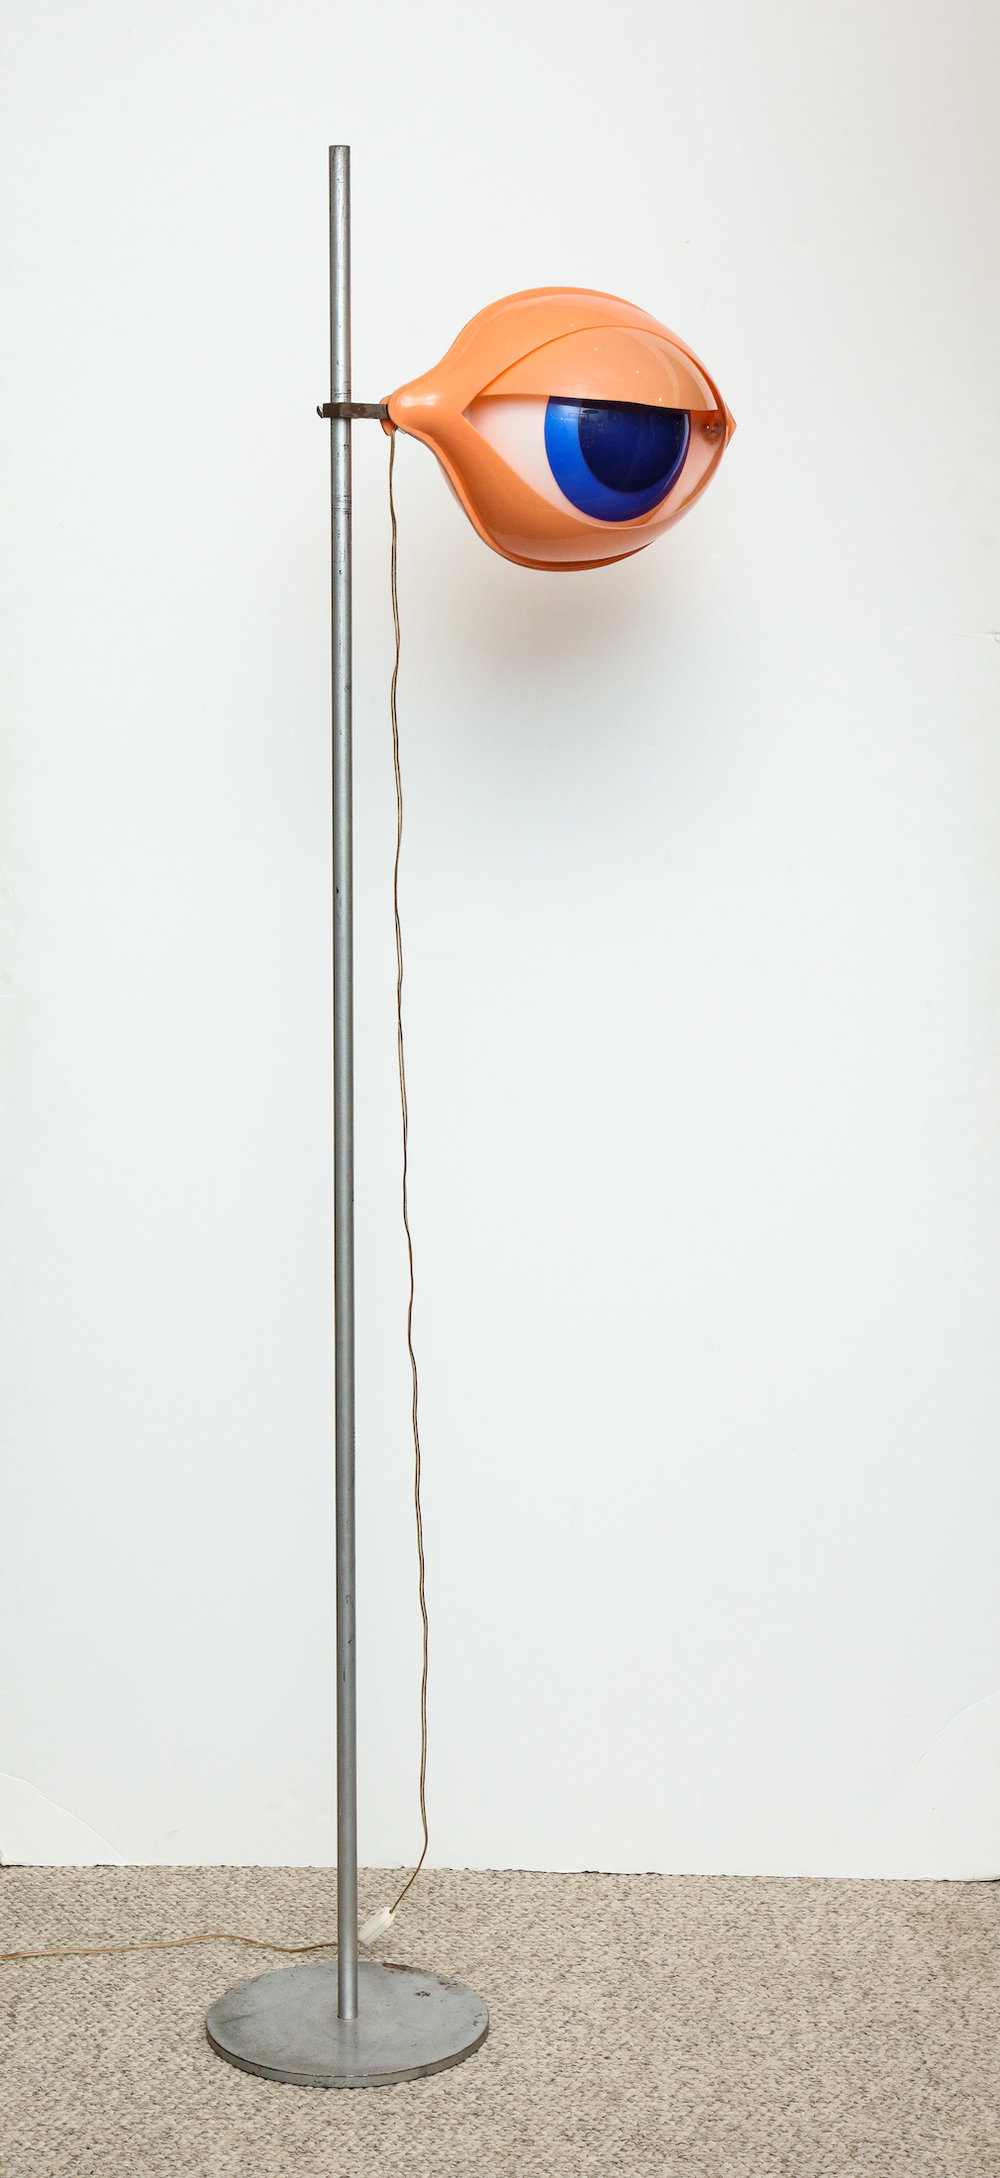 nicola 6R1A2868.jpg